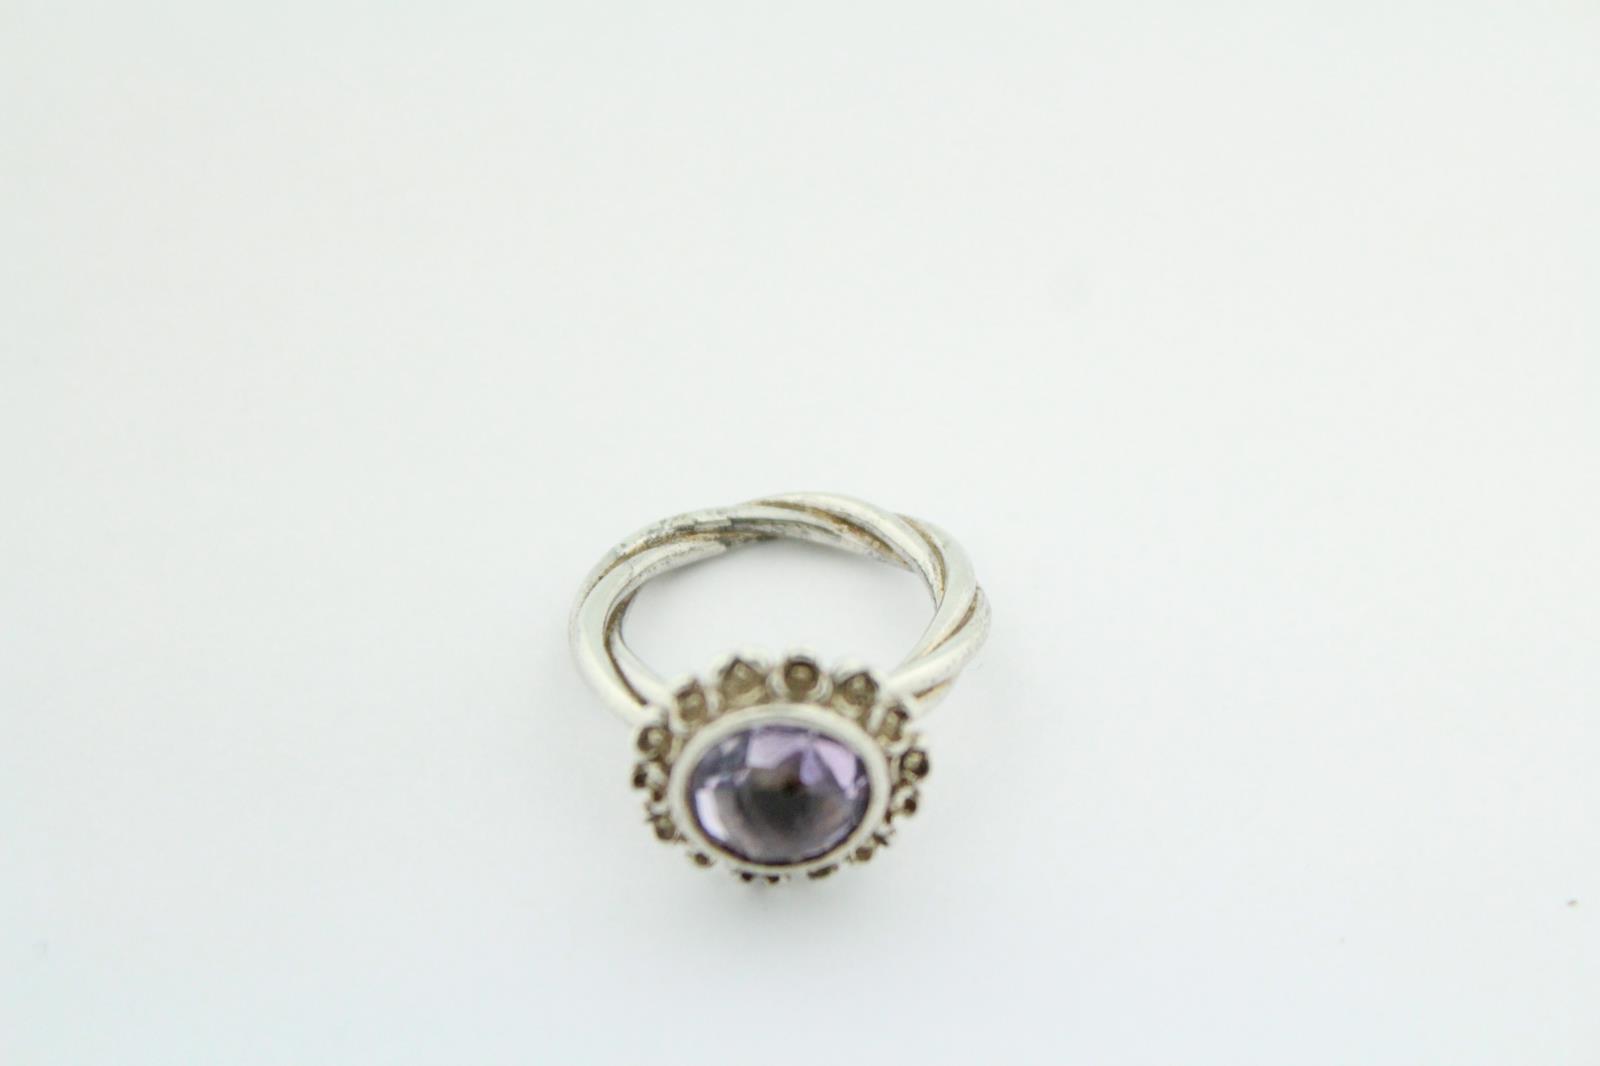 dc8e69660 Pandora (190850PAM) Floral Elegance - Size: 6 1/2 - .925 Sterling ...